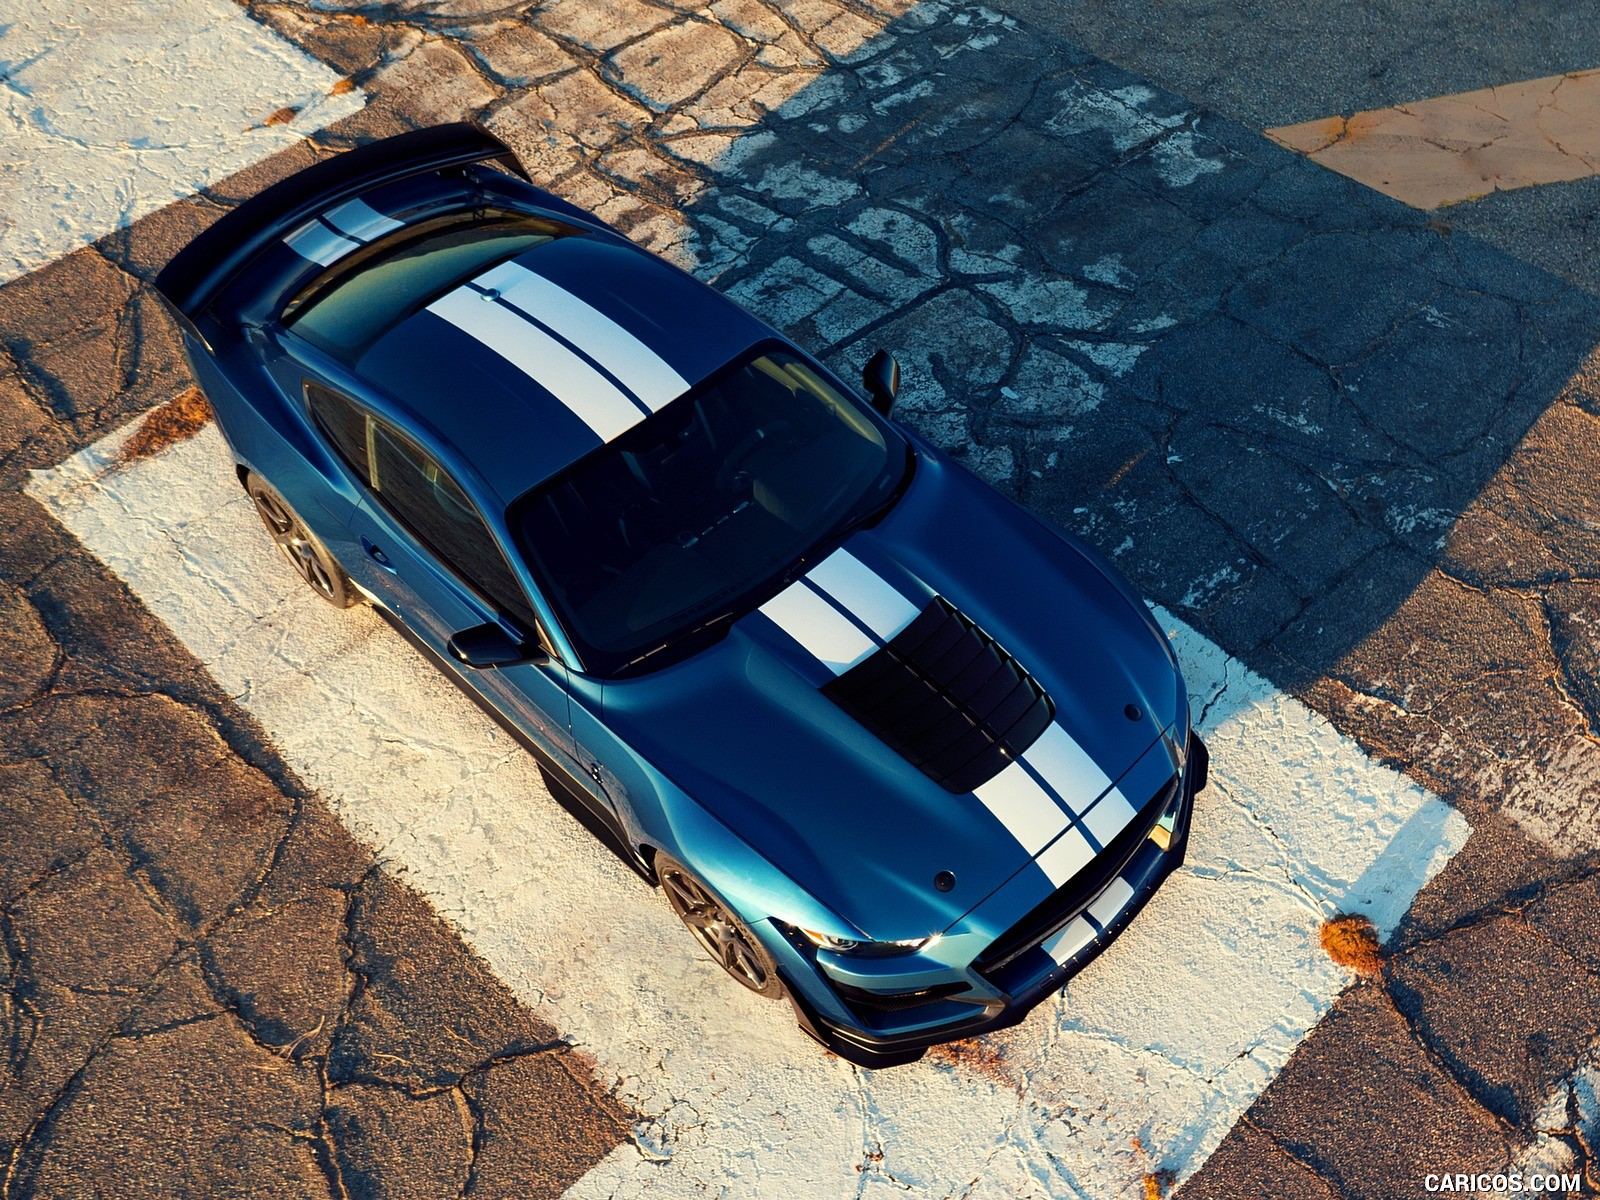 Ford Mustang Shelby duvar kağıtları 1